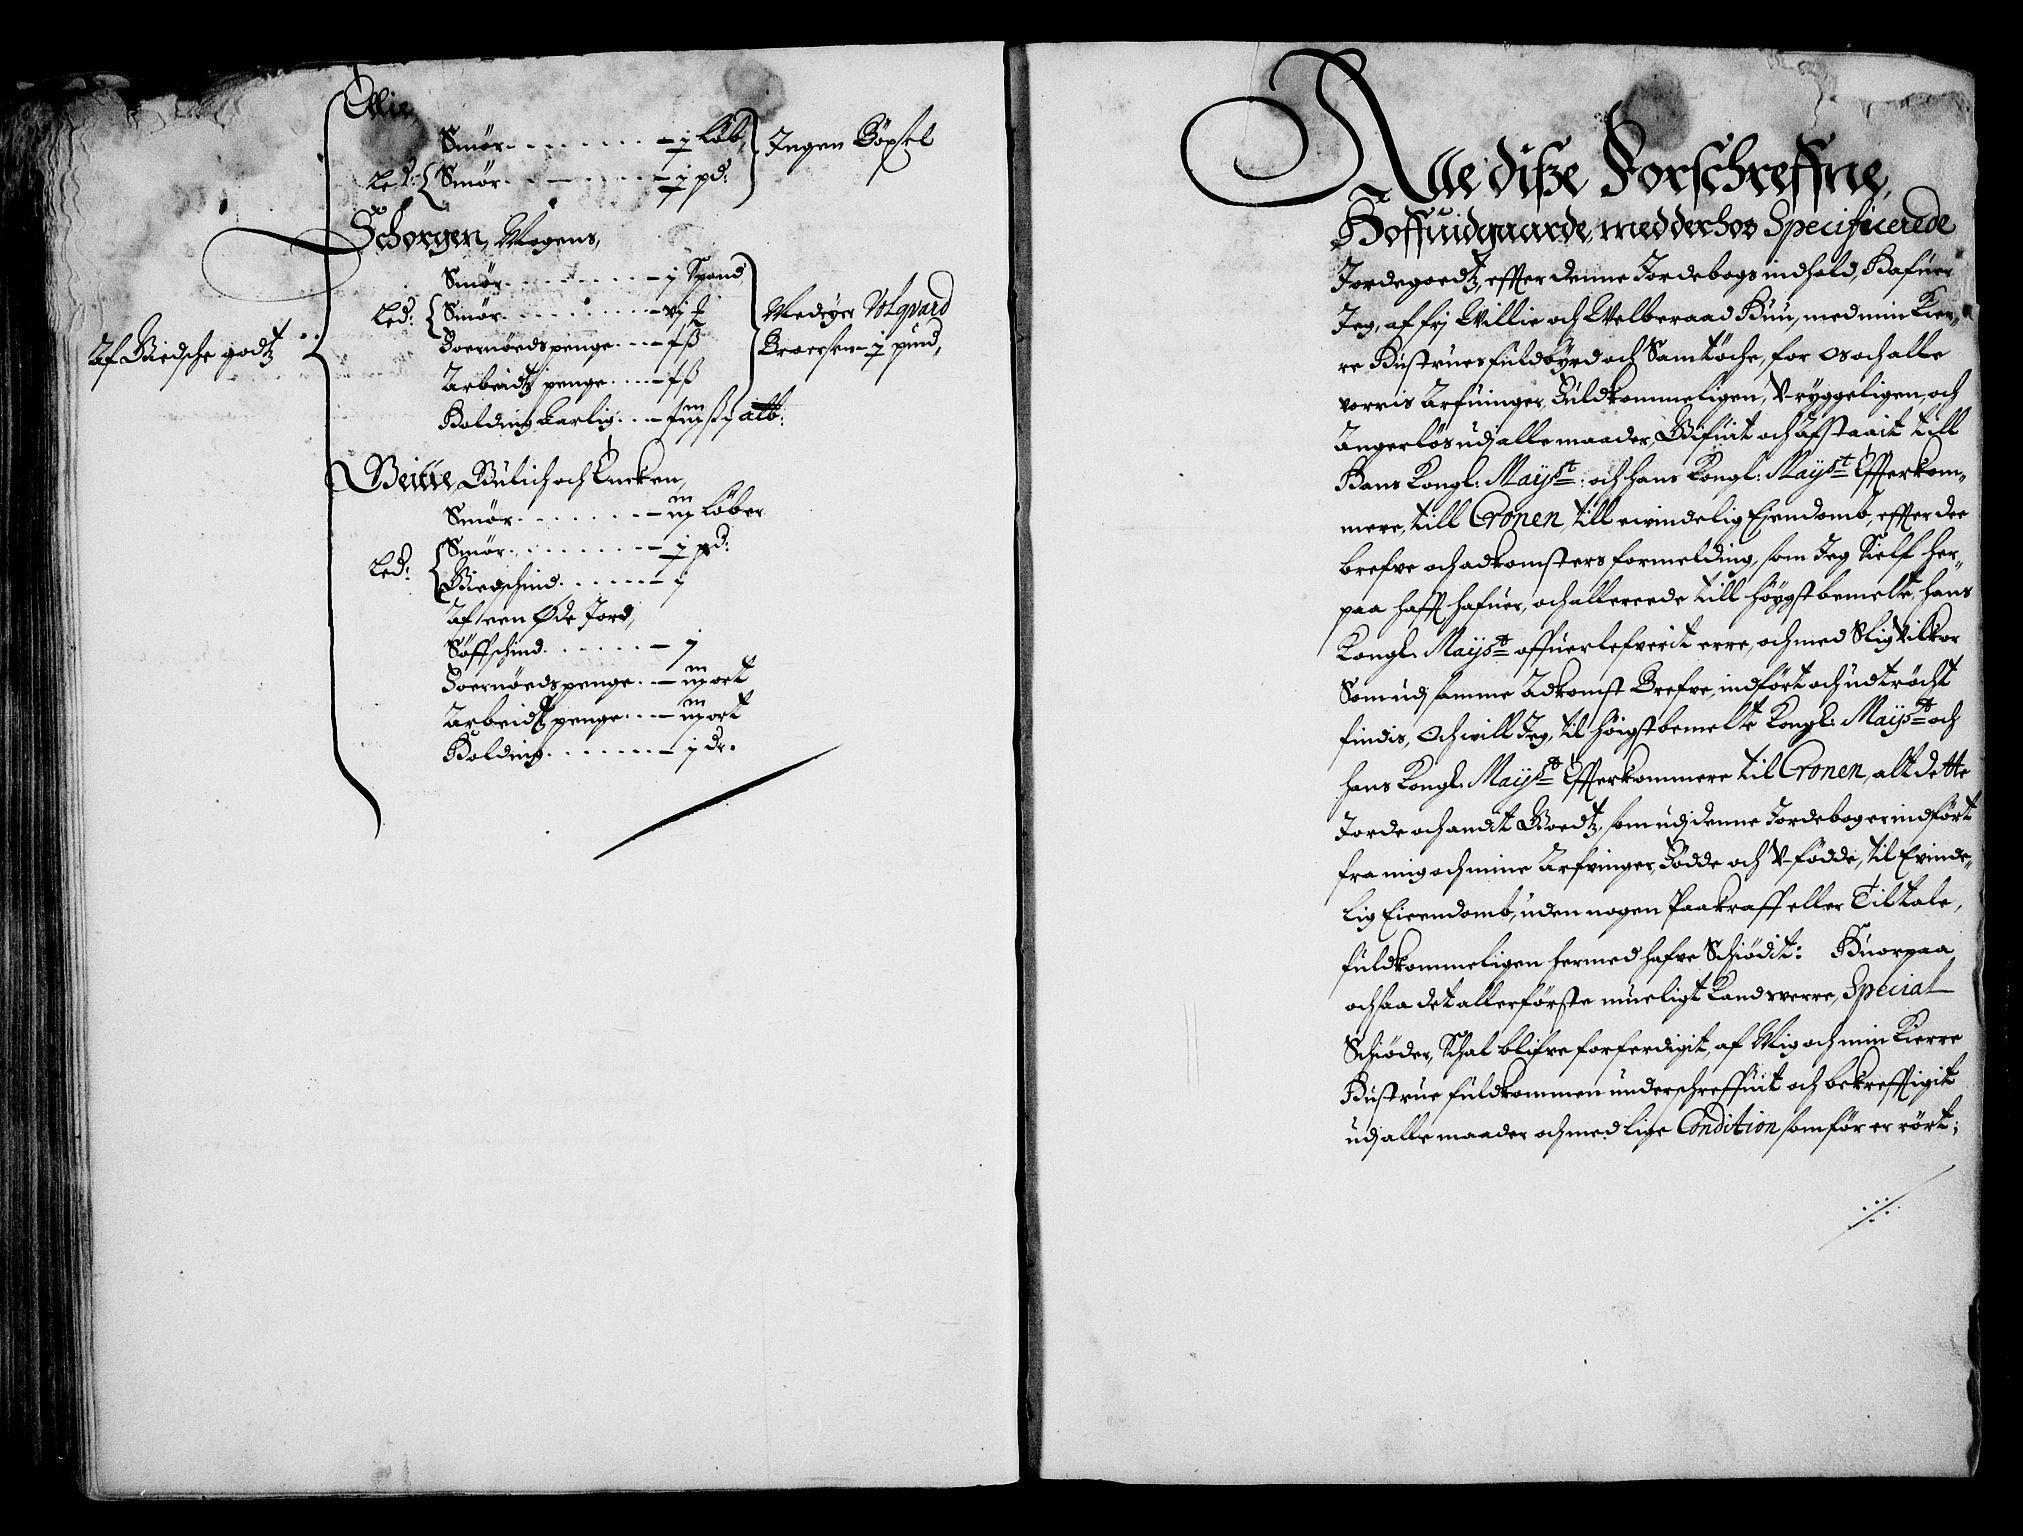 RA, Rentekammeret inntil 1814, Realistisk ordnet avdeling, On/L0001: Statens gods, 1651, s. 229